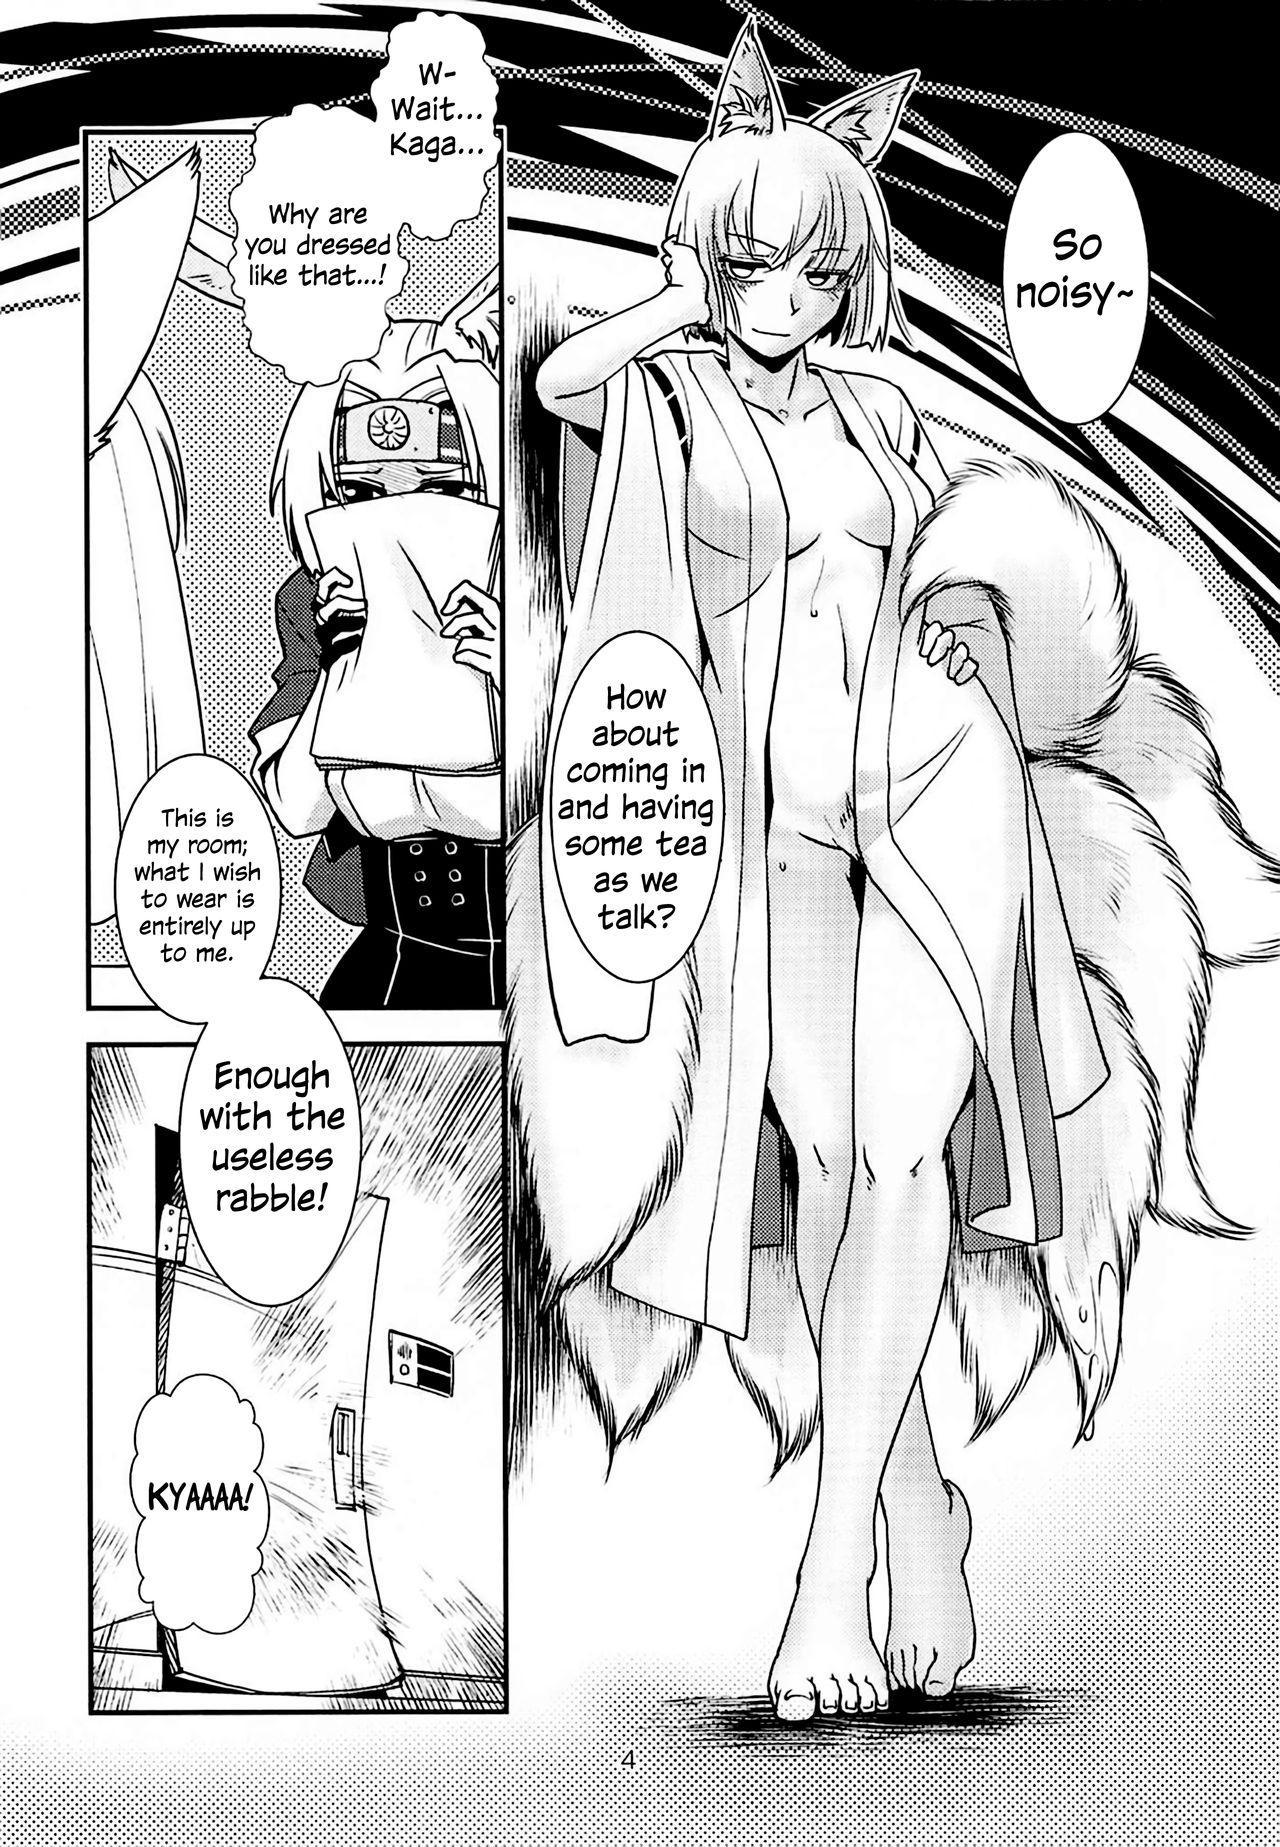 Kimi-tachi wa Hontou ni Ecchi da na!! | The Two Of You Are So Lewd! 5